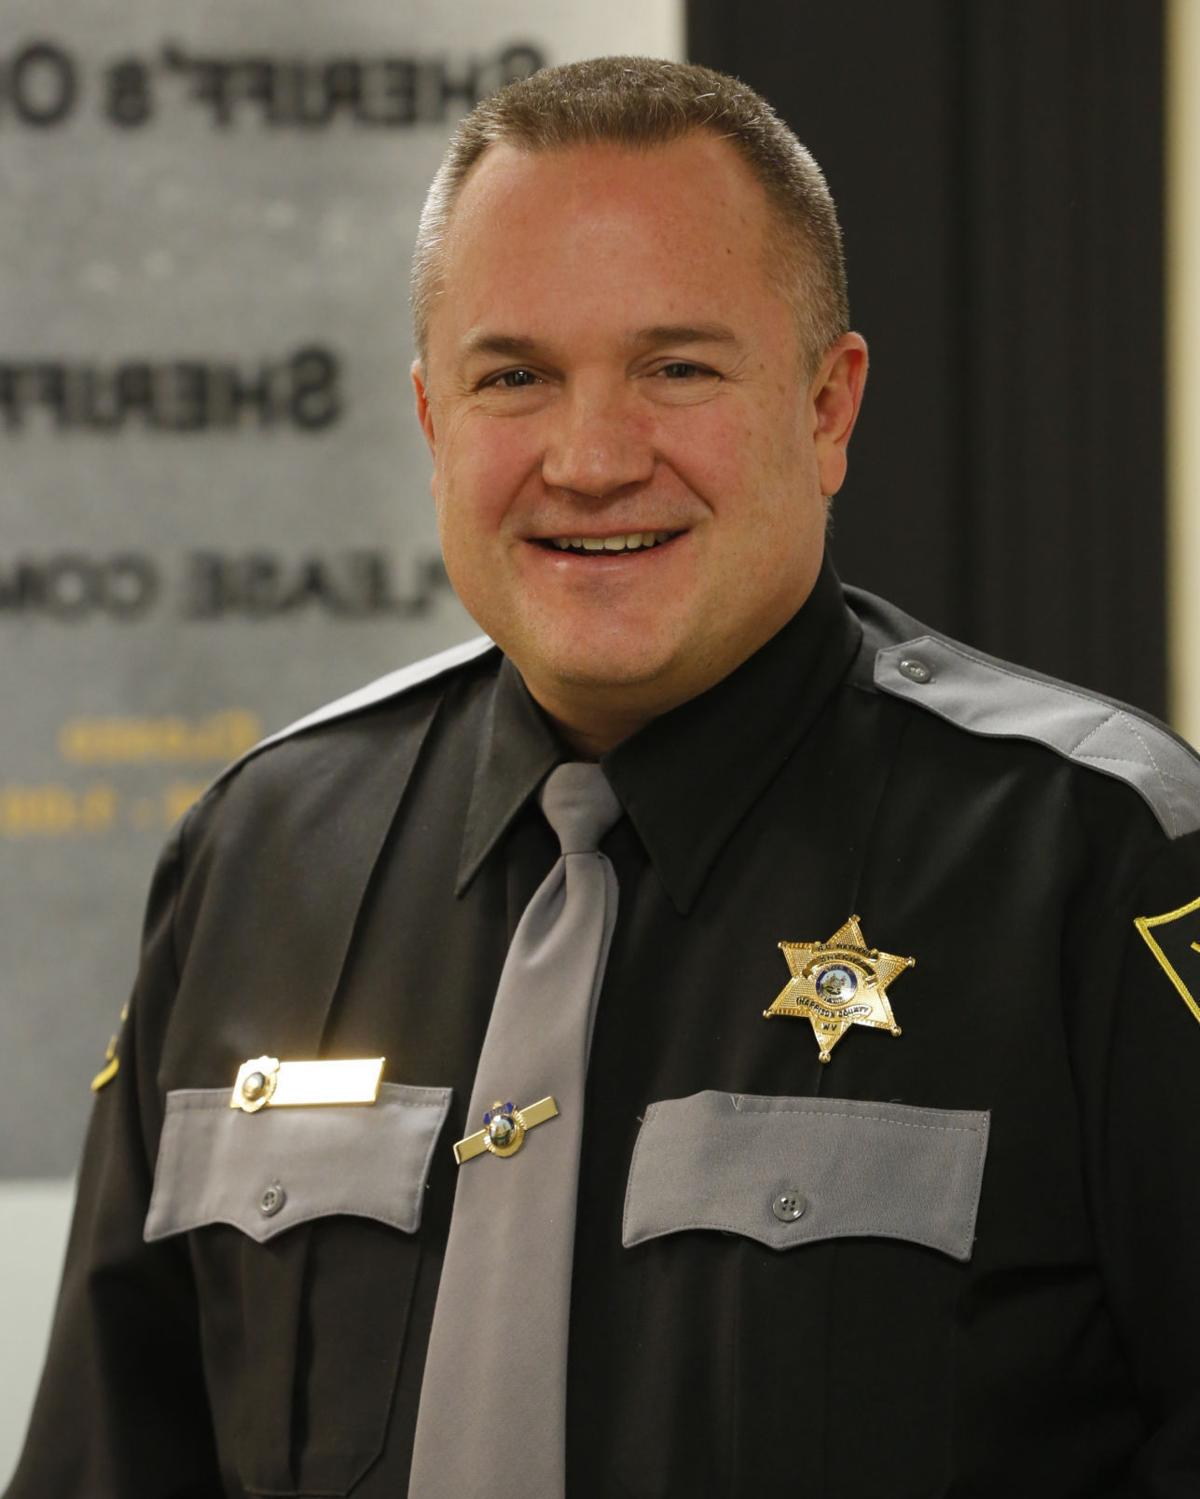 Harrison County Sheriff Robert Matheny